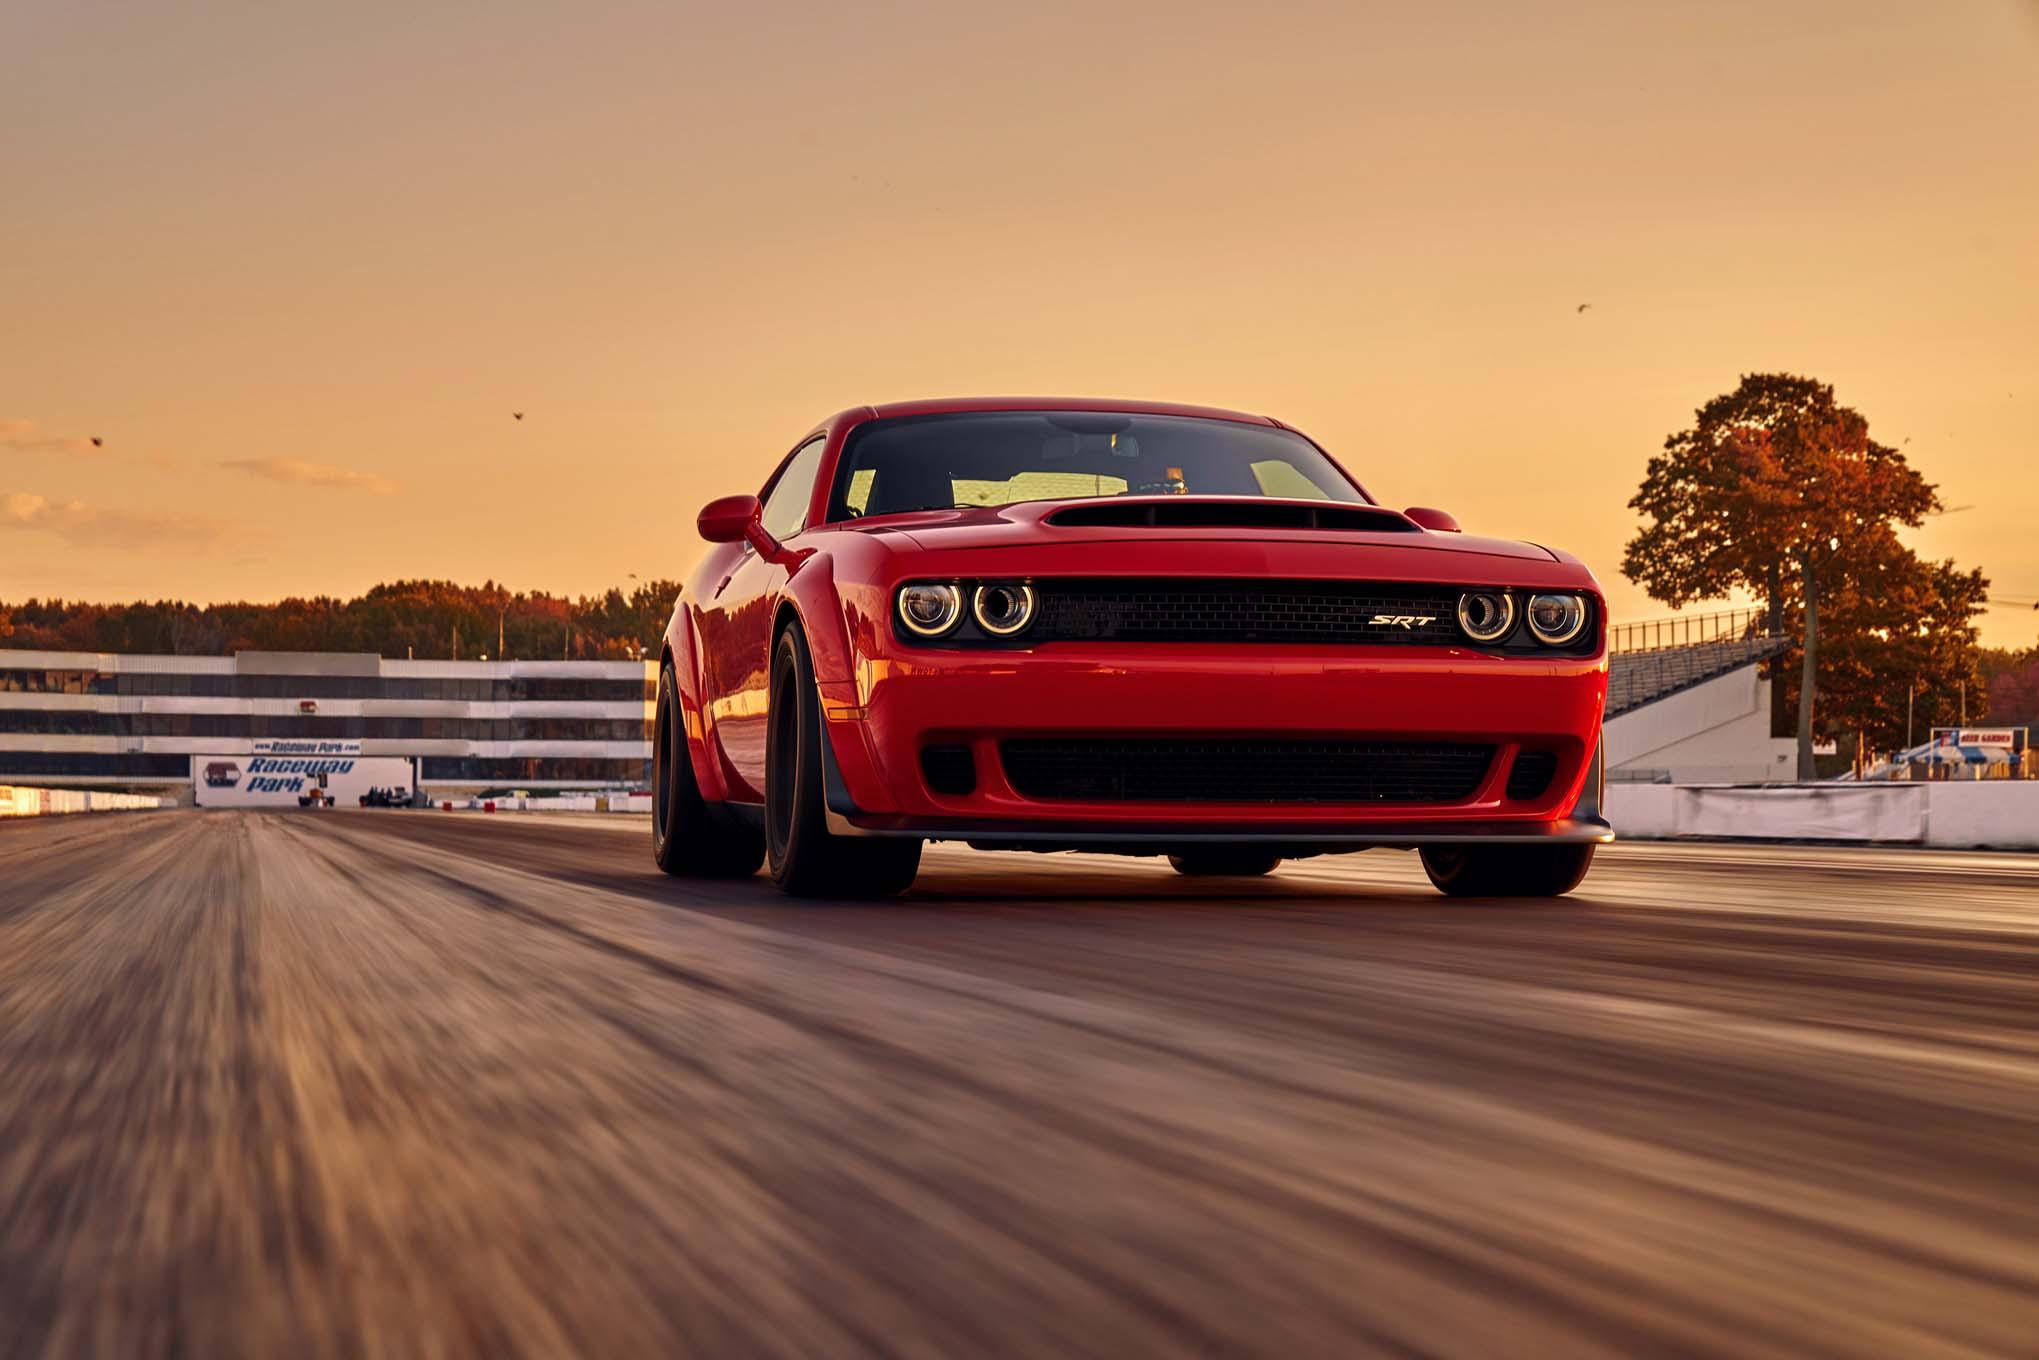 2018-Dodge-Challenger-SRT-Demon-front-th